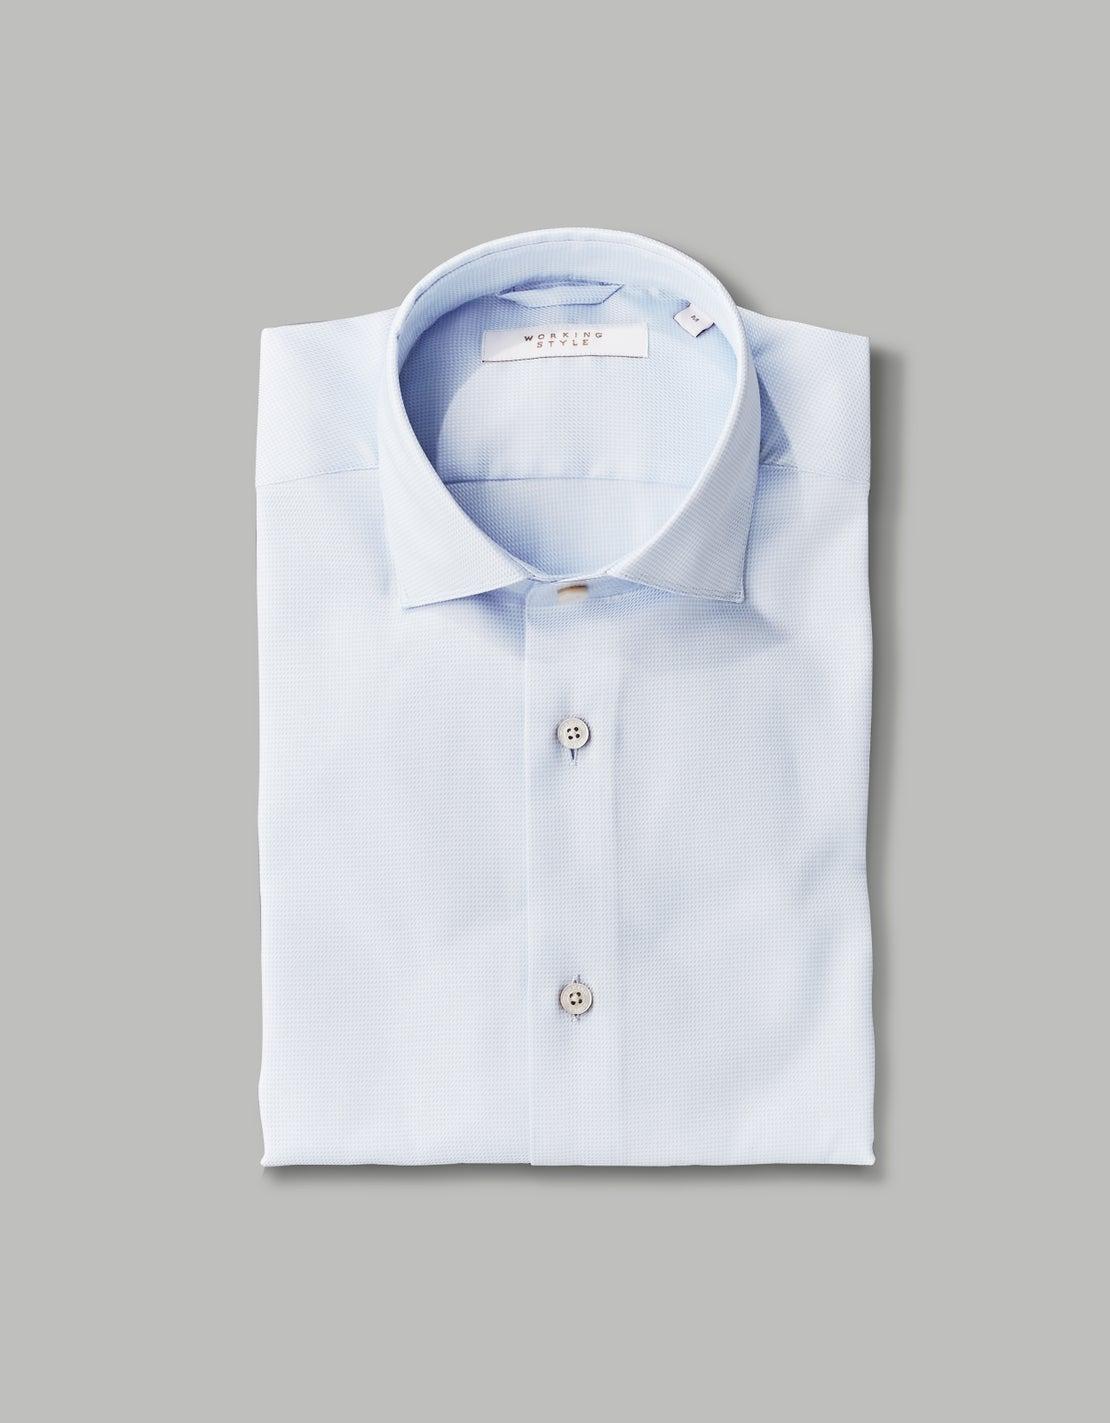 Pale Blue Micro Puppytooth Shirt